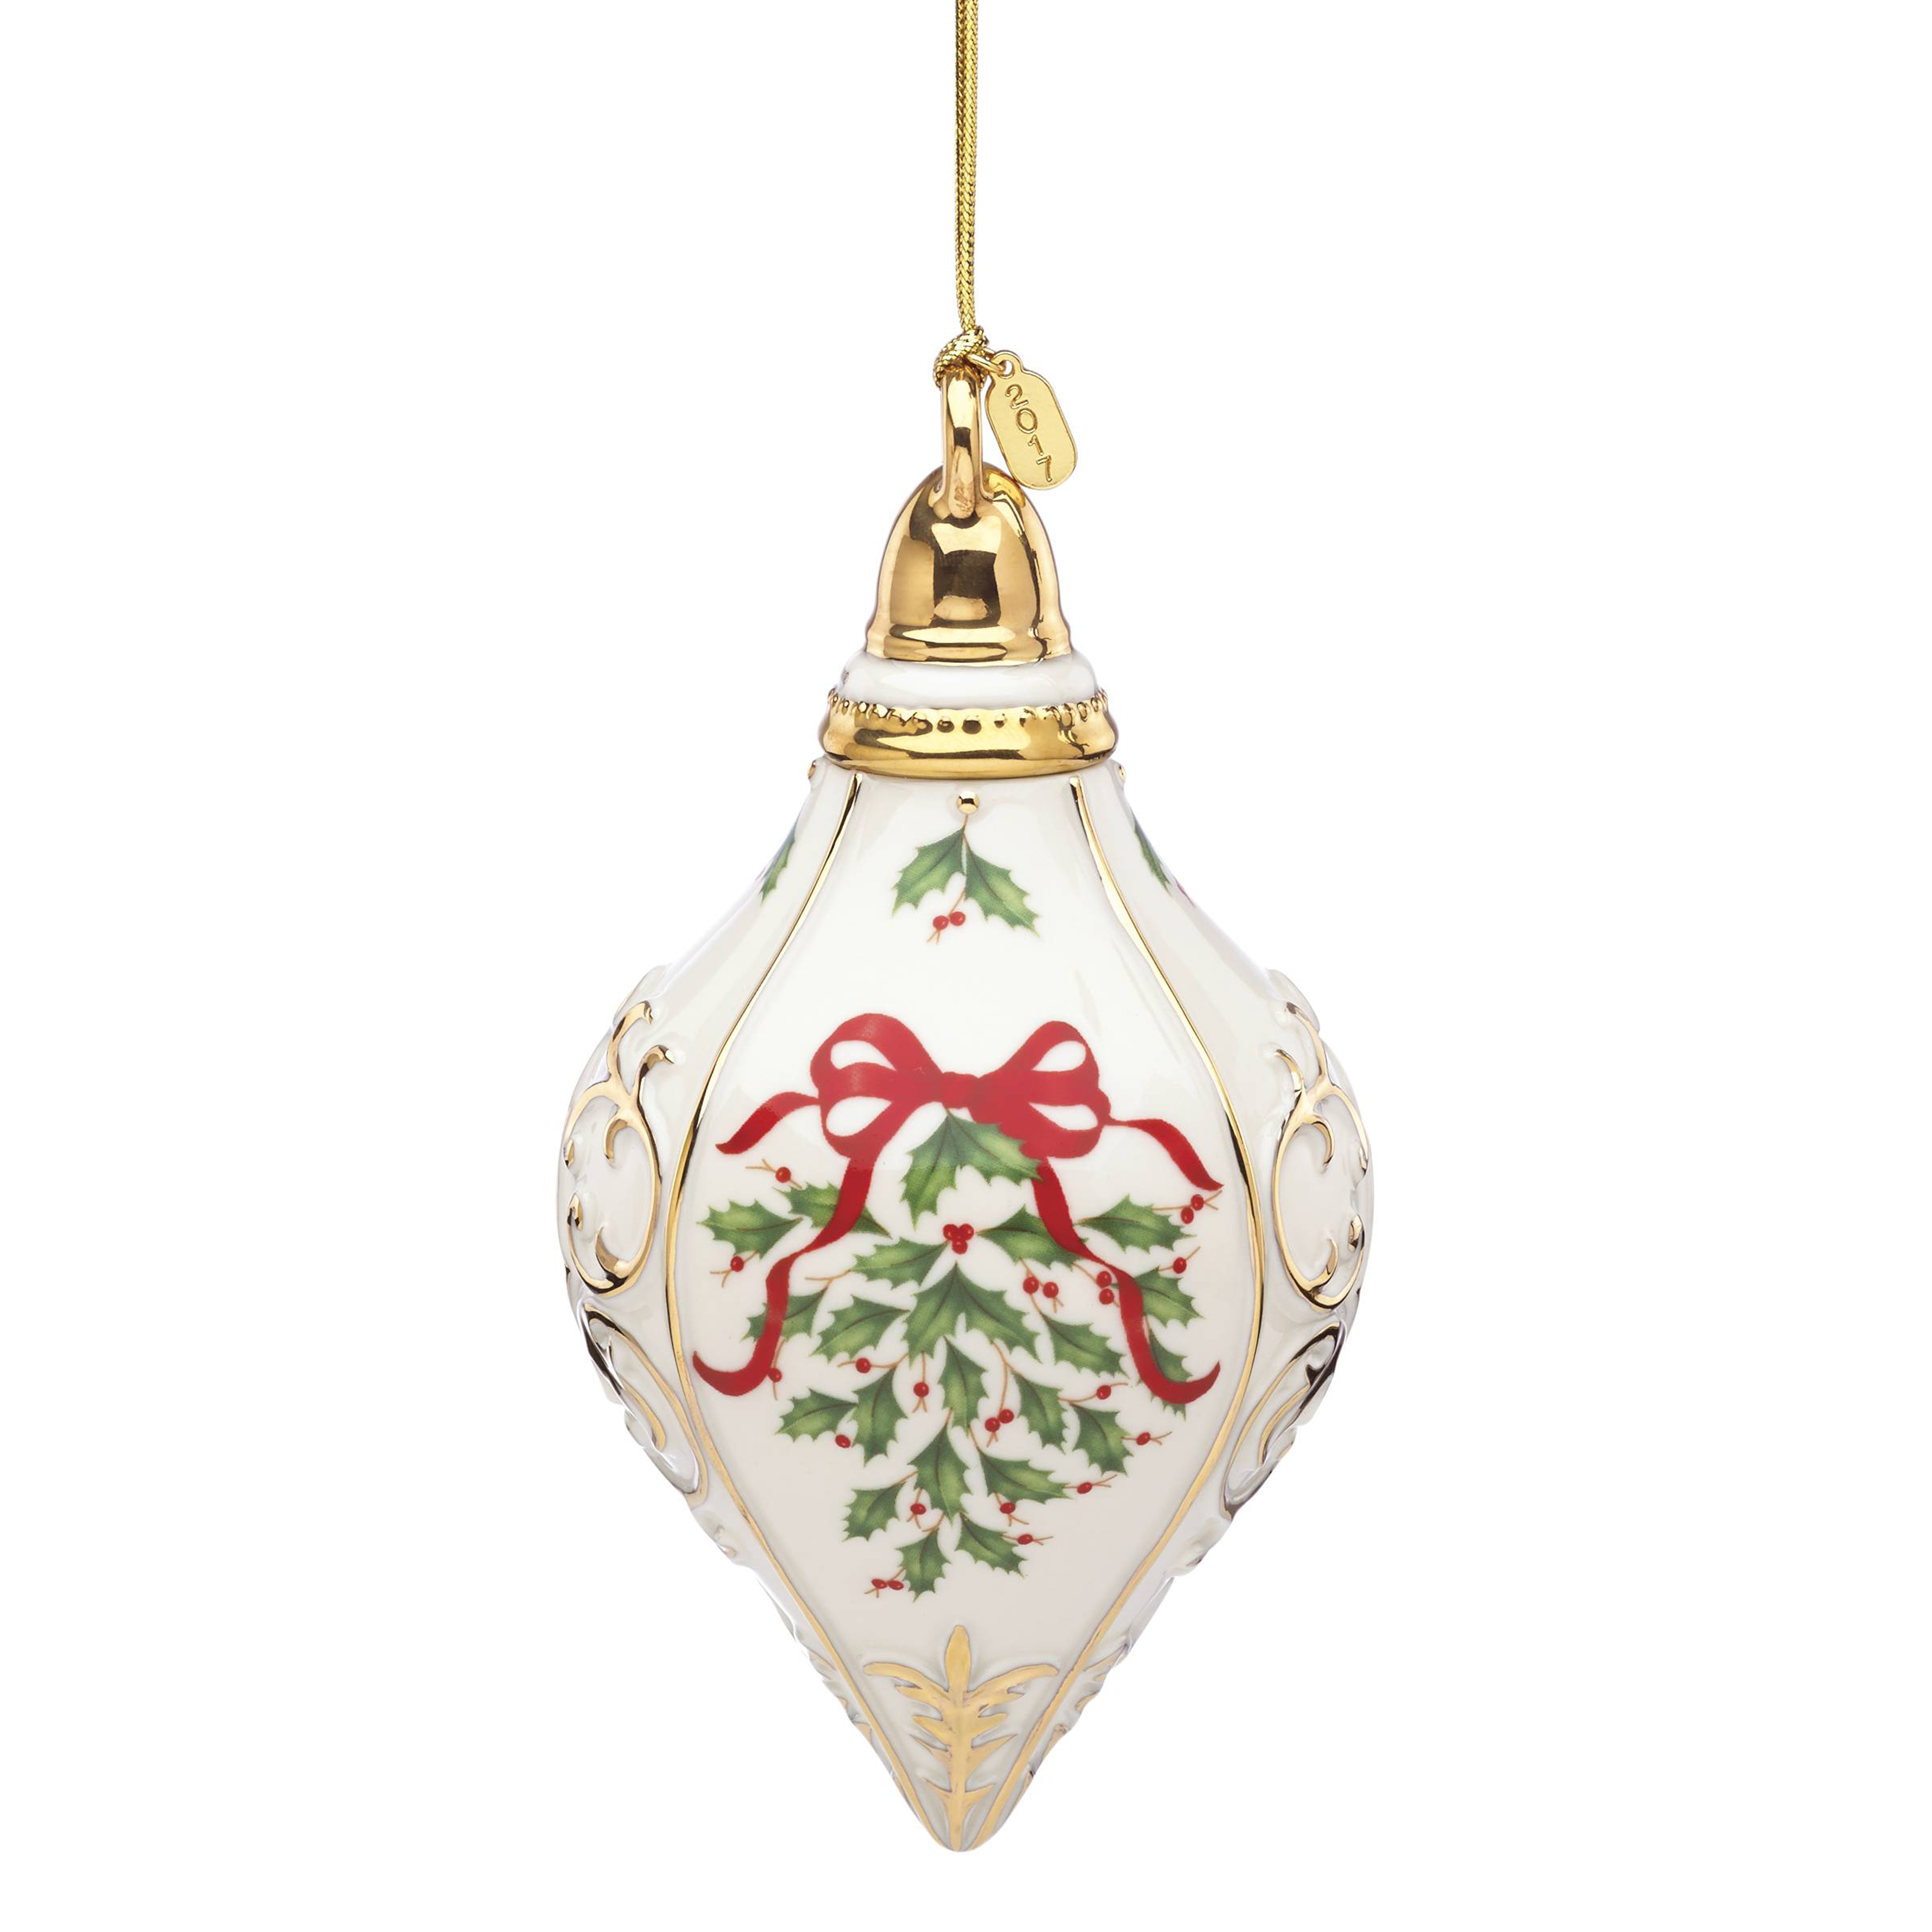 Lenox Annual Holiday Ornament 2017 | Lenox Christmas Ornaments